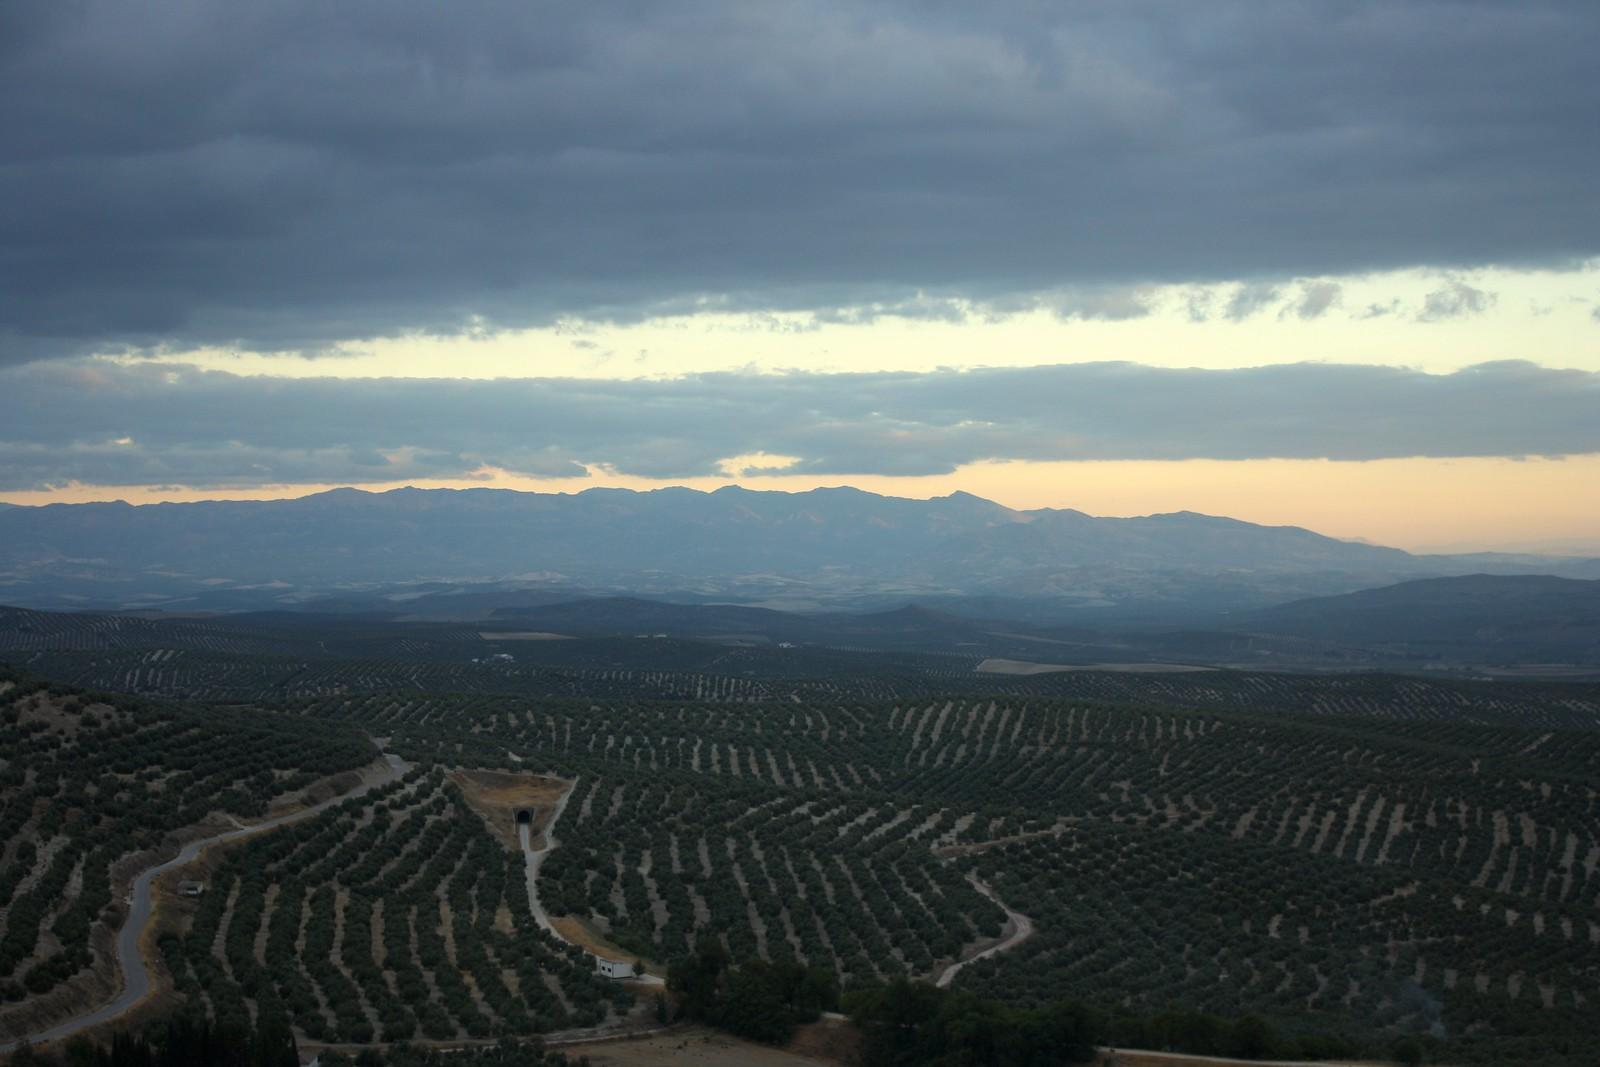 Mountains of Cazorla, Spain